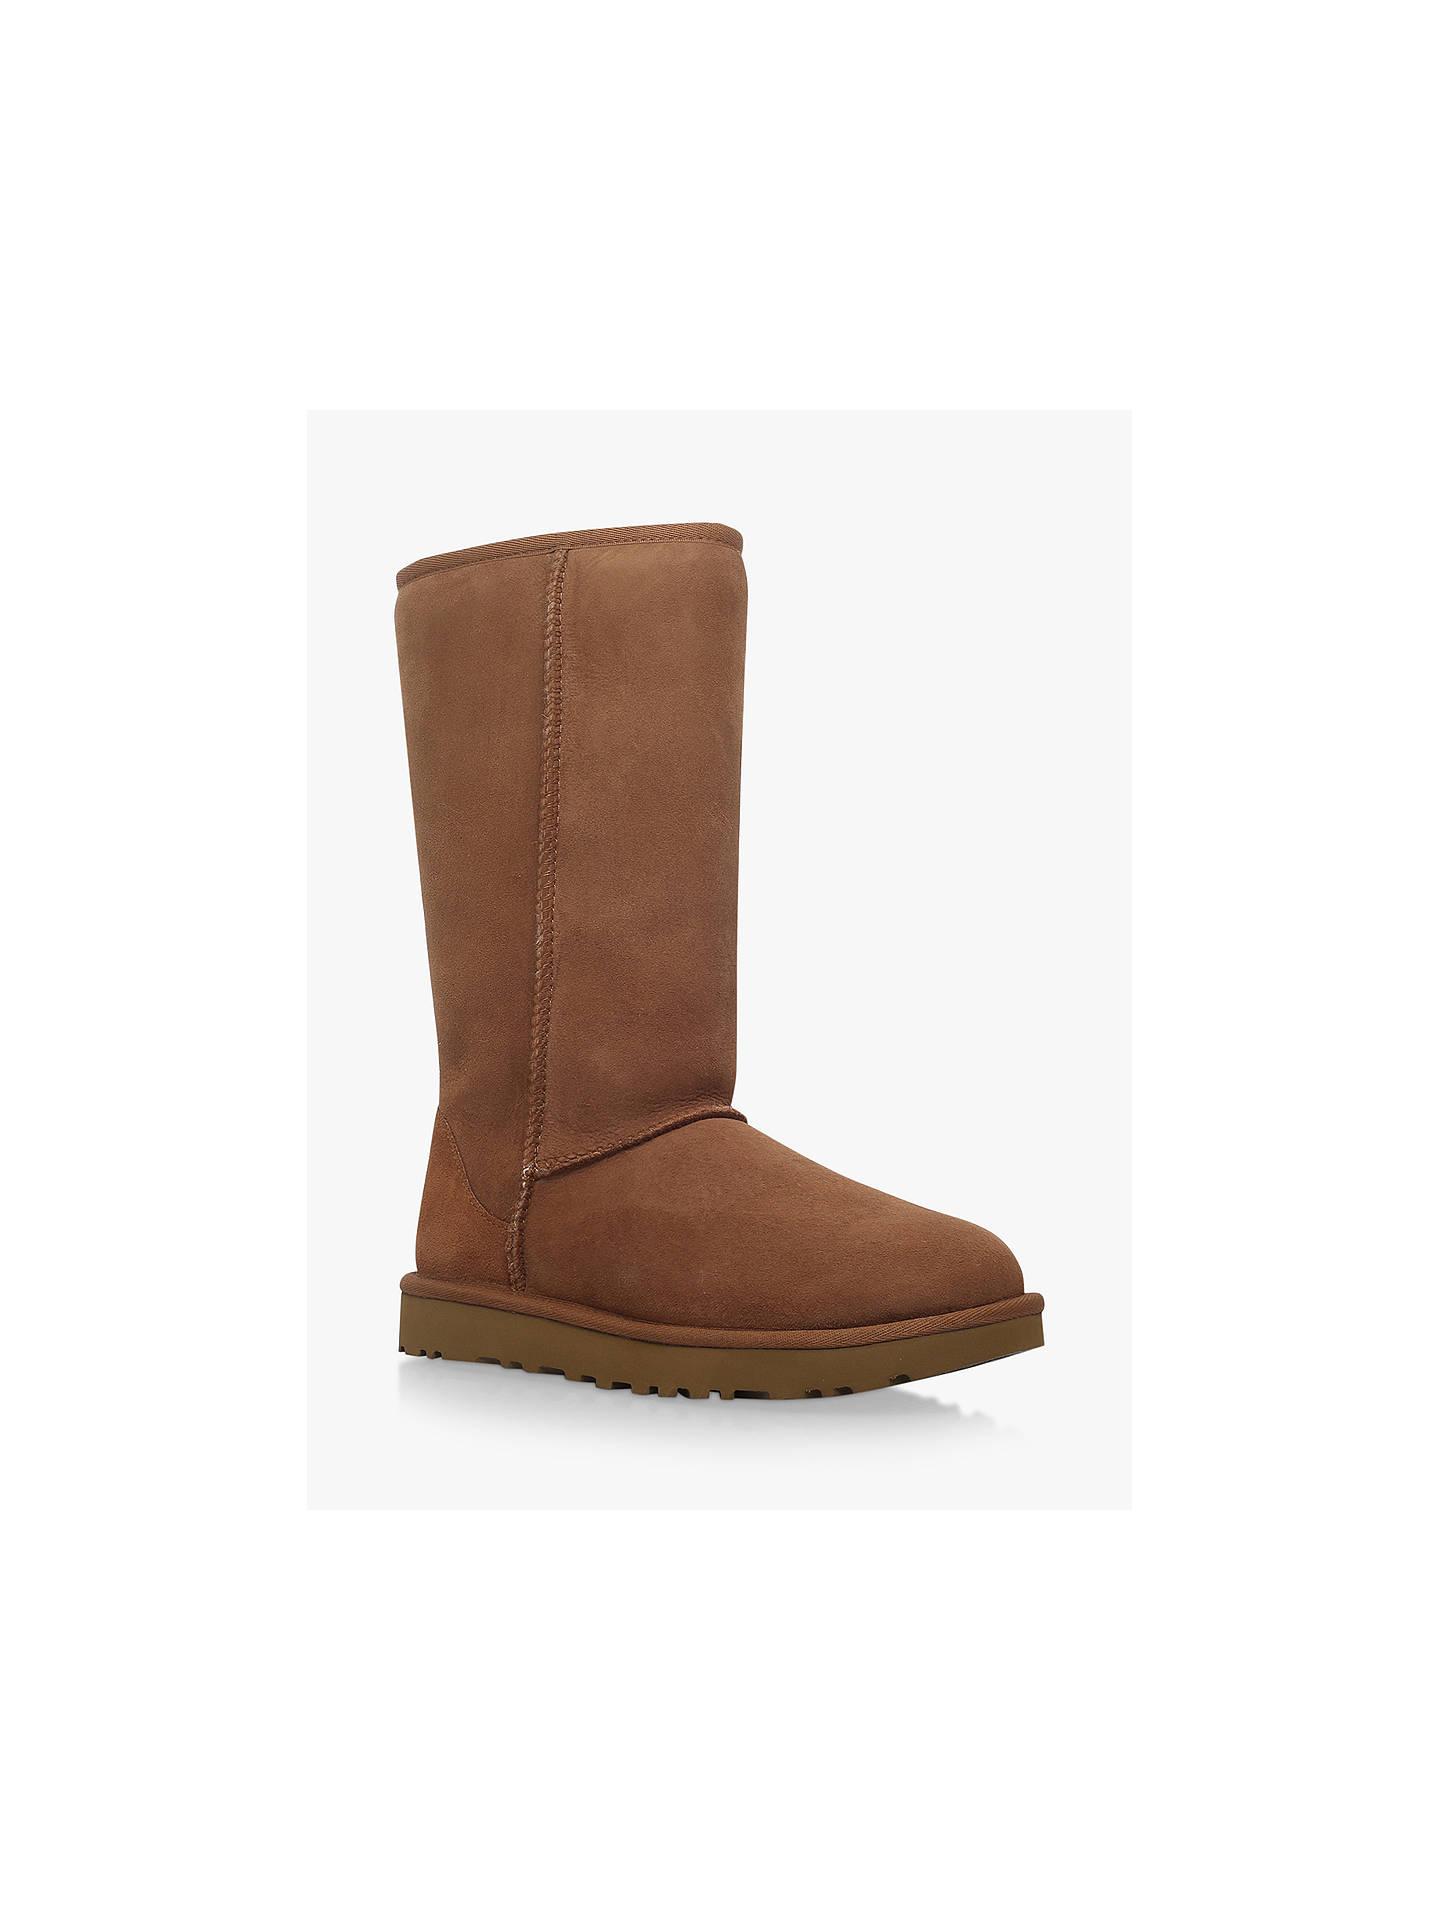 ee52f048a89 UGG Classic II Tall Sheepskin Knee High Boots, Chestnut